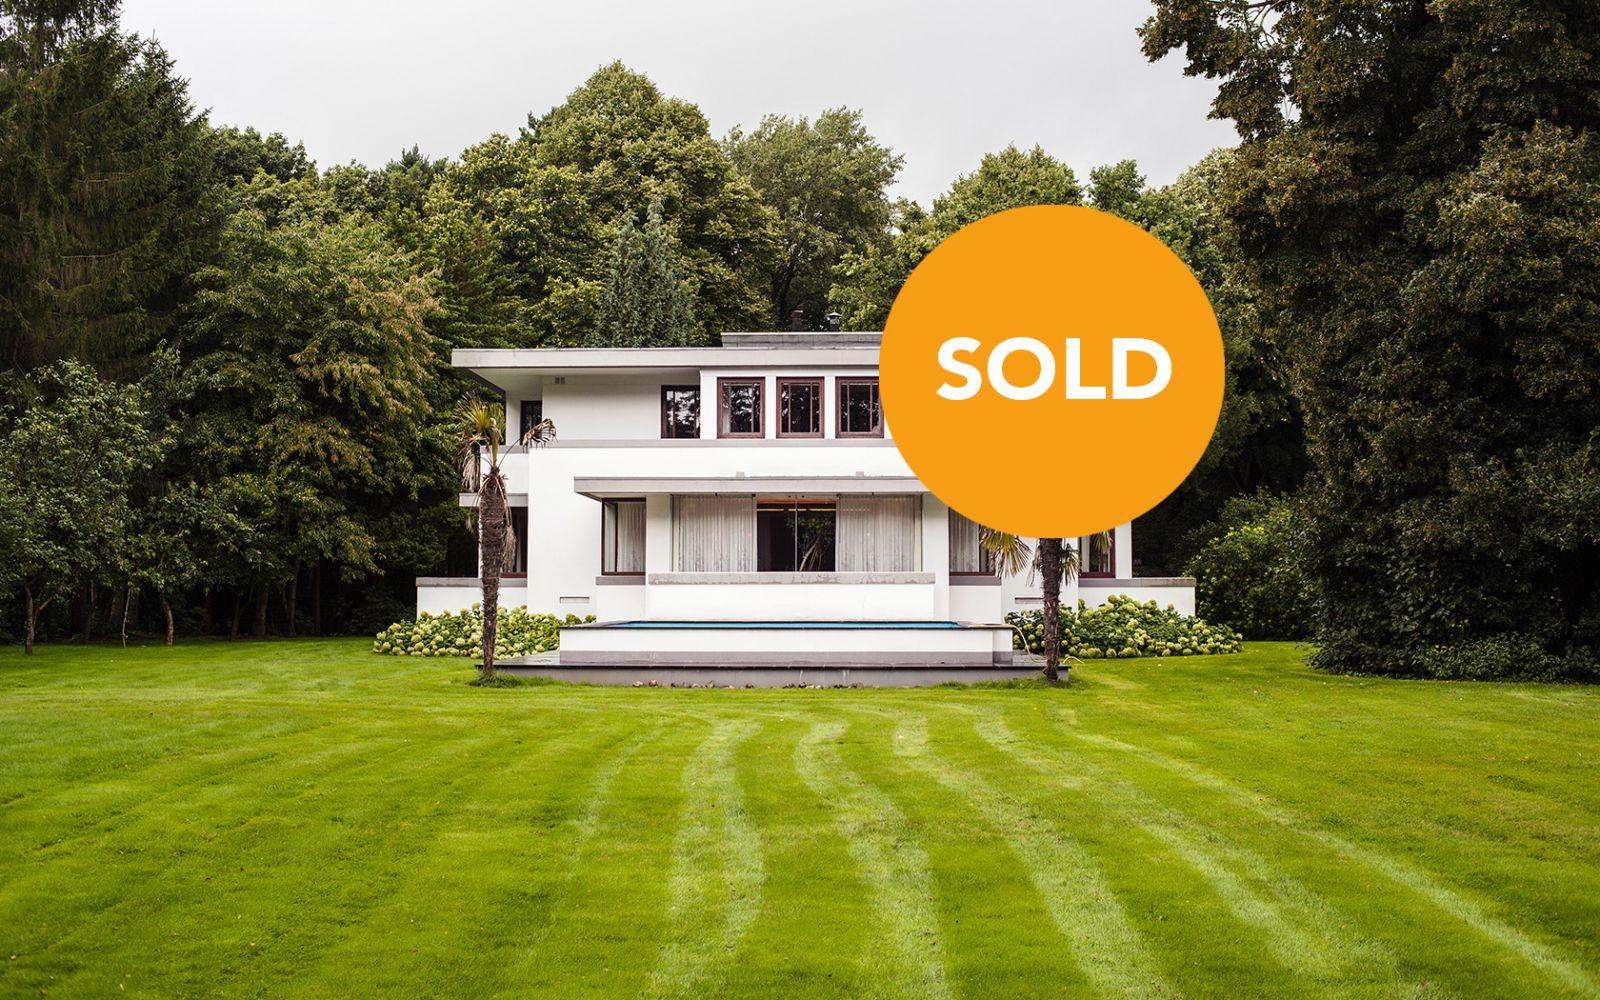 Style De Veranda Moderne villa henny, geometric style icon in the netherlands